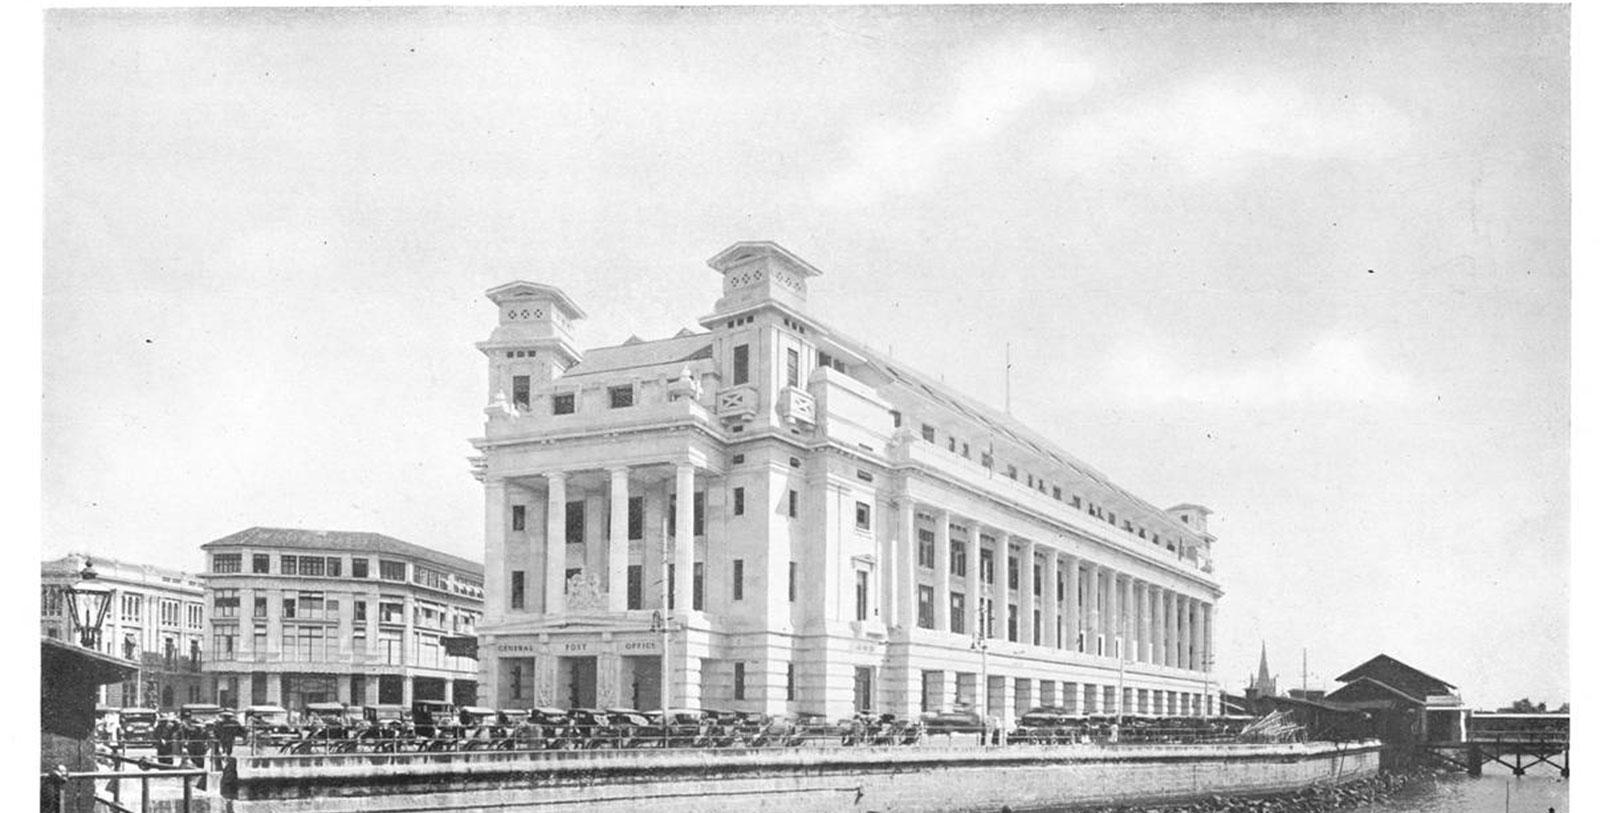 Historic image of the Fullerton Singapore